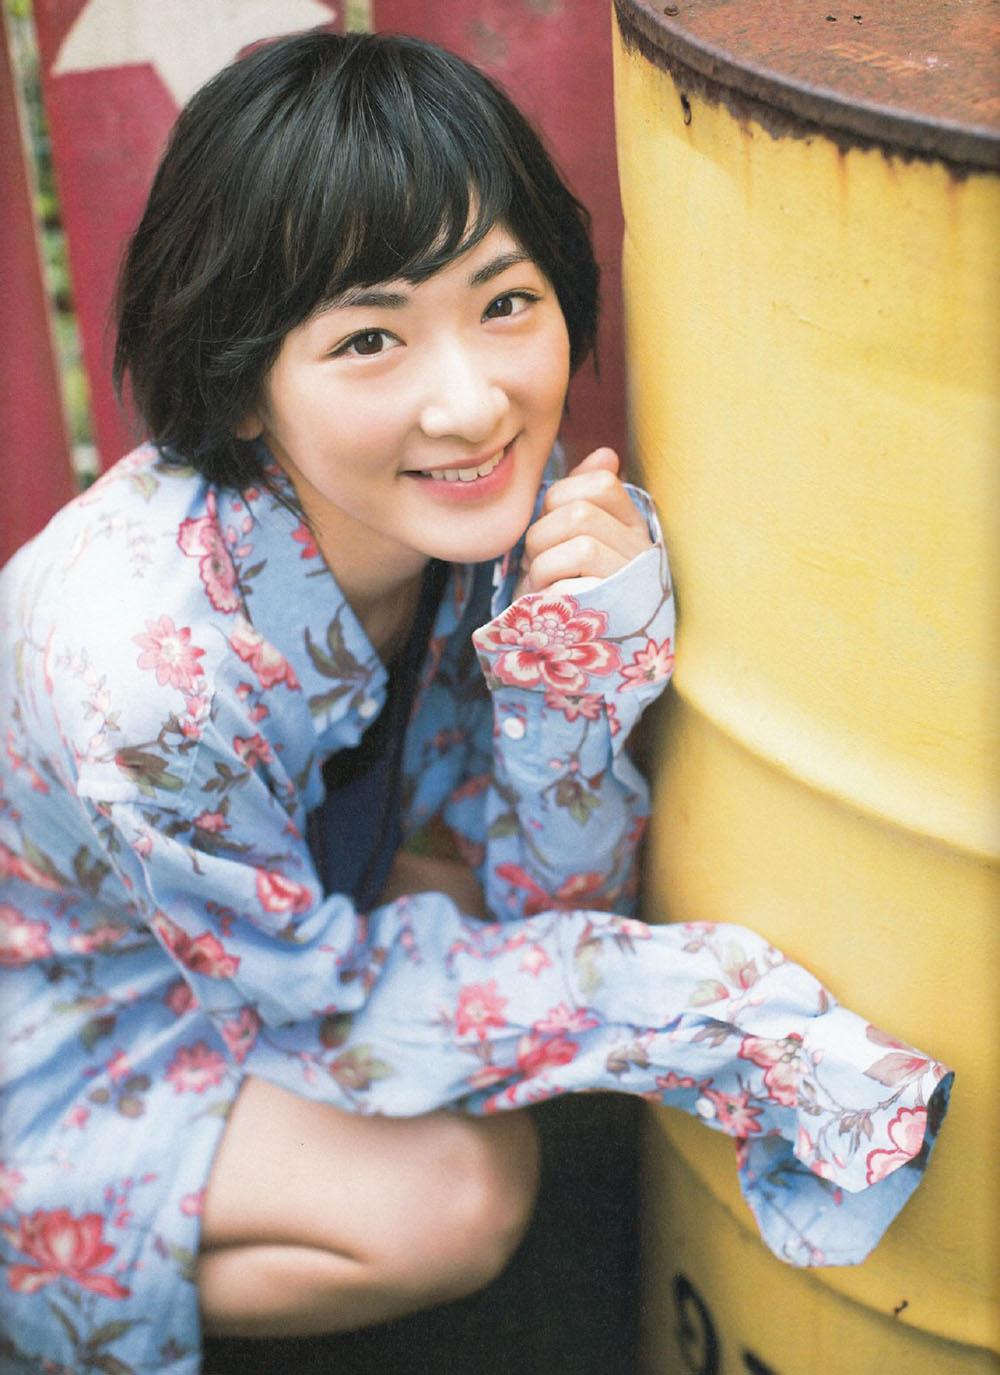 Ikoma Rina 生駒里奈 Nogizaka46, B.L.T Graph. Vol.09 Gravure